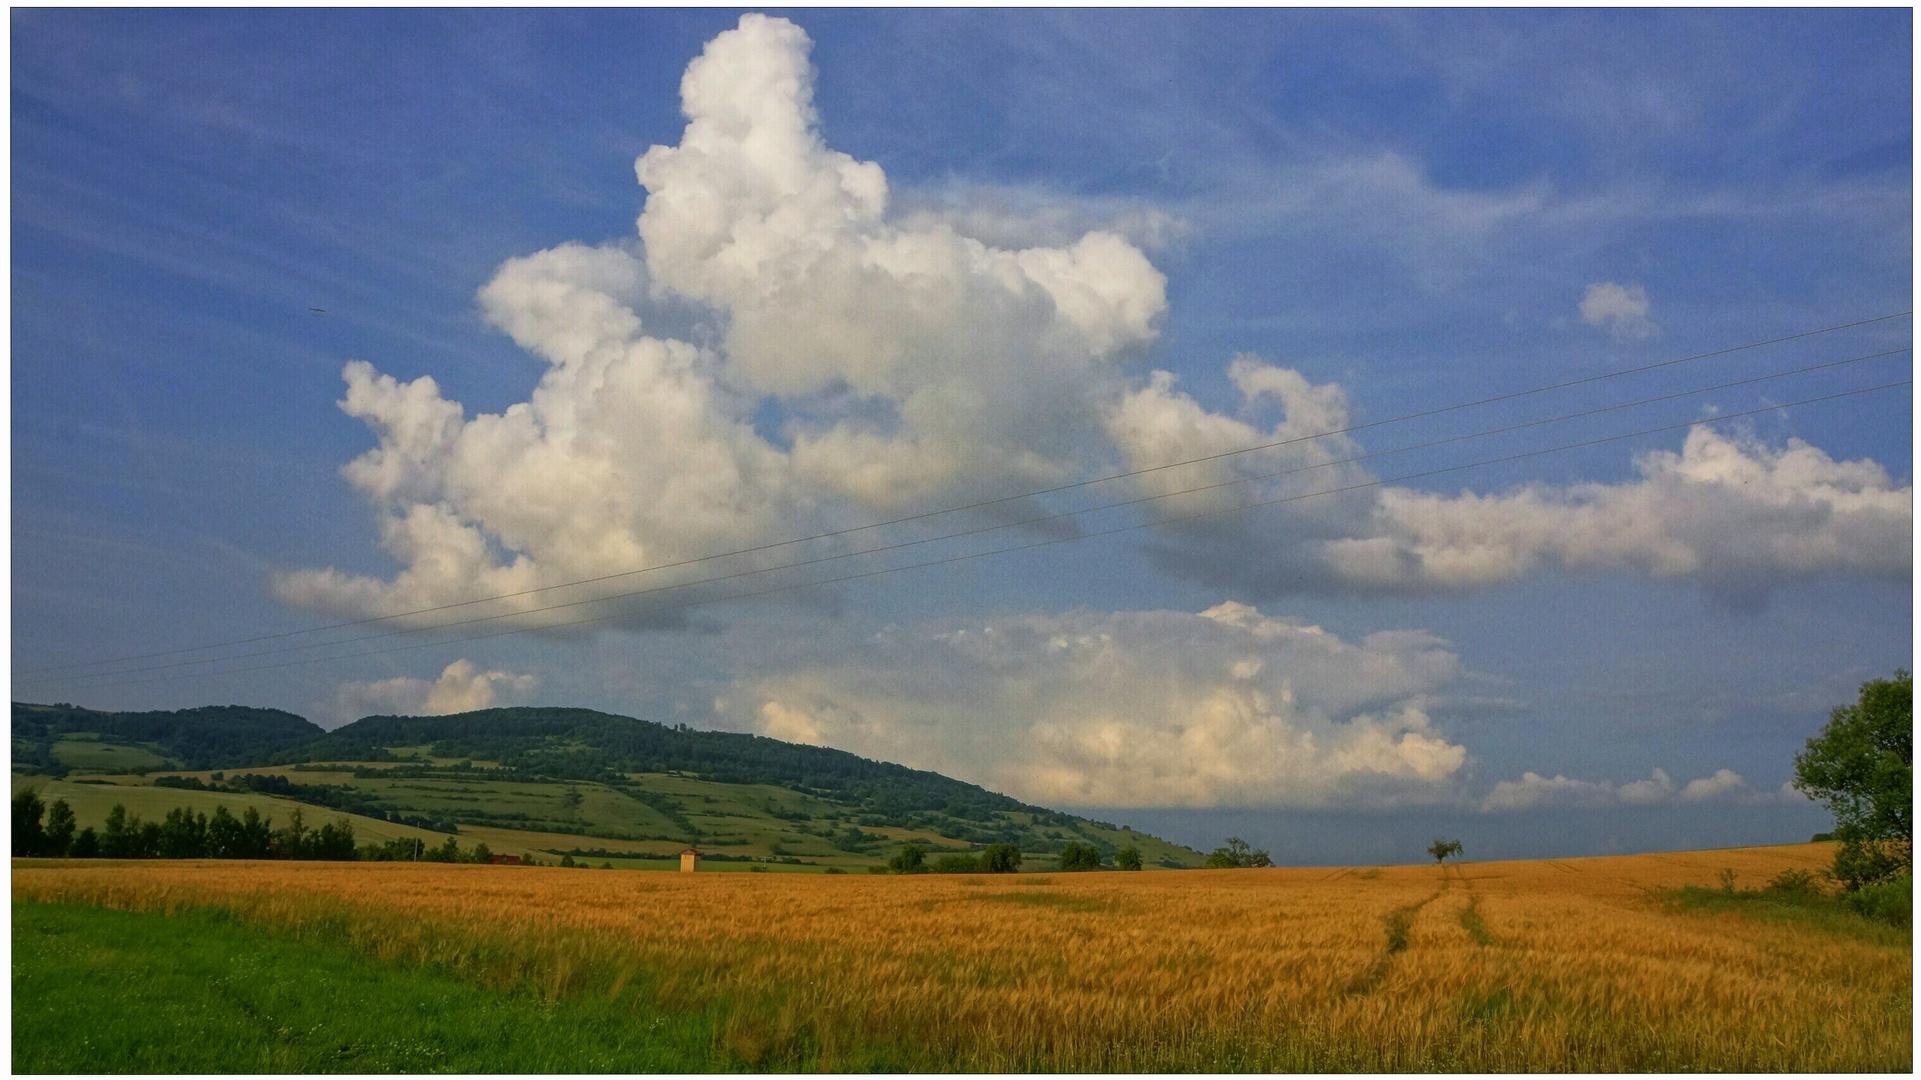 Getreidefeld VIII (campo de cereales VIII)